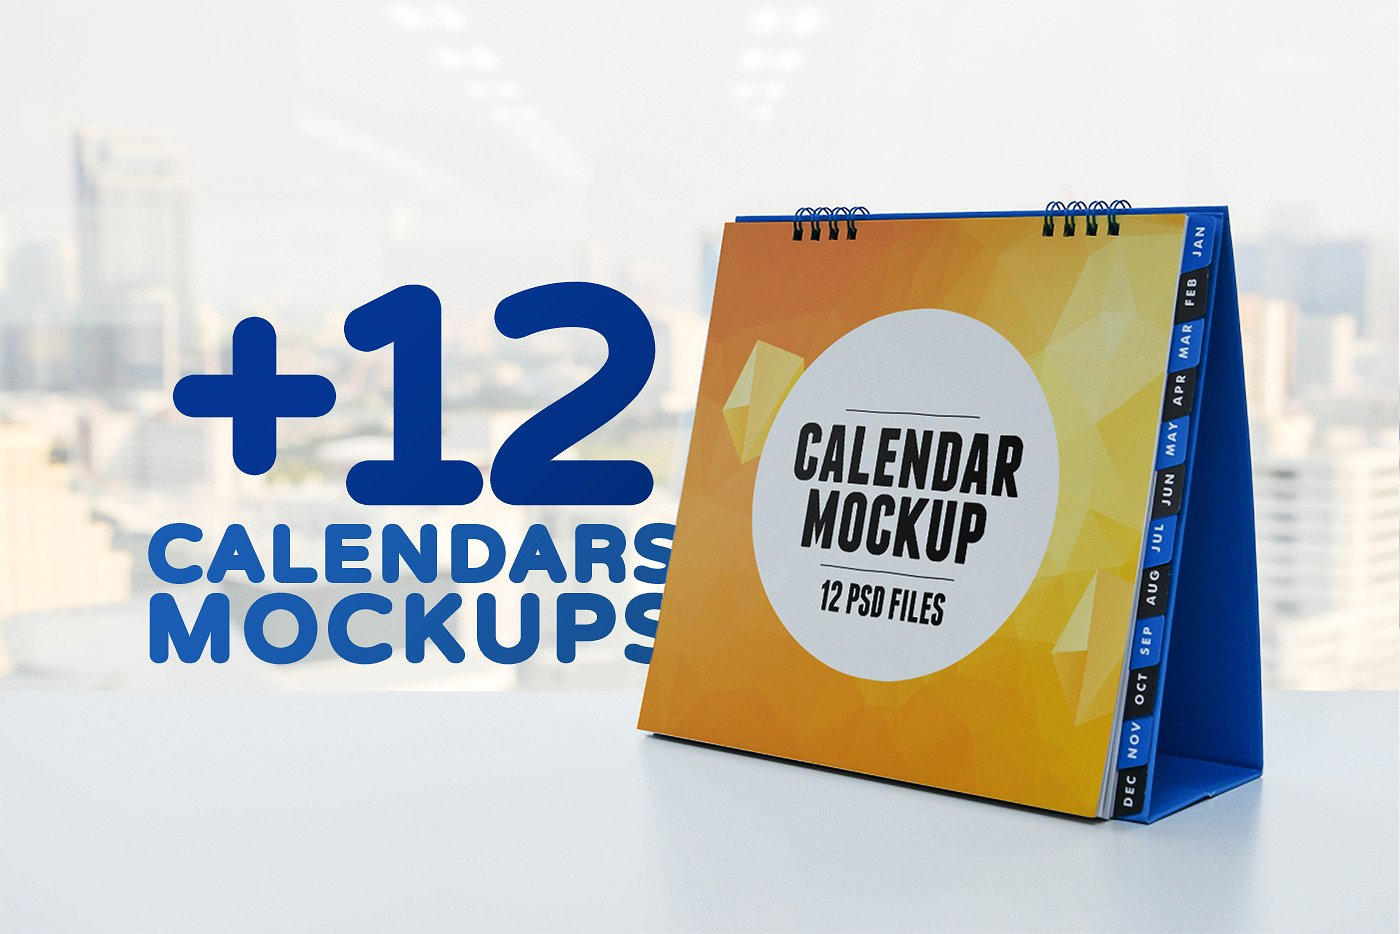 25+ Attractive Wall and Desk Calendar Mockups | Decolore Net